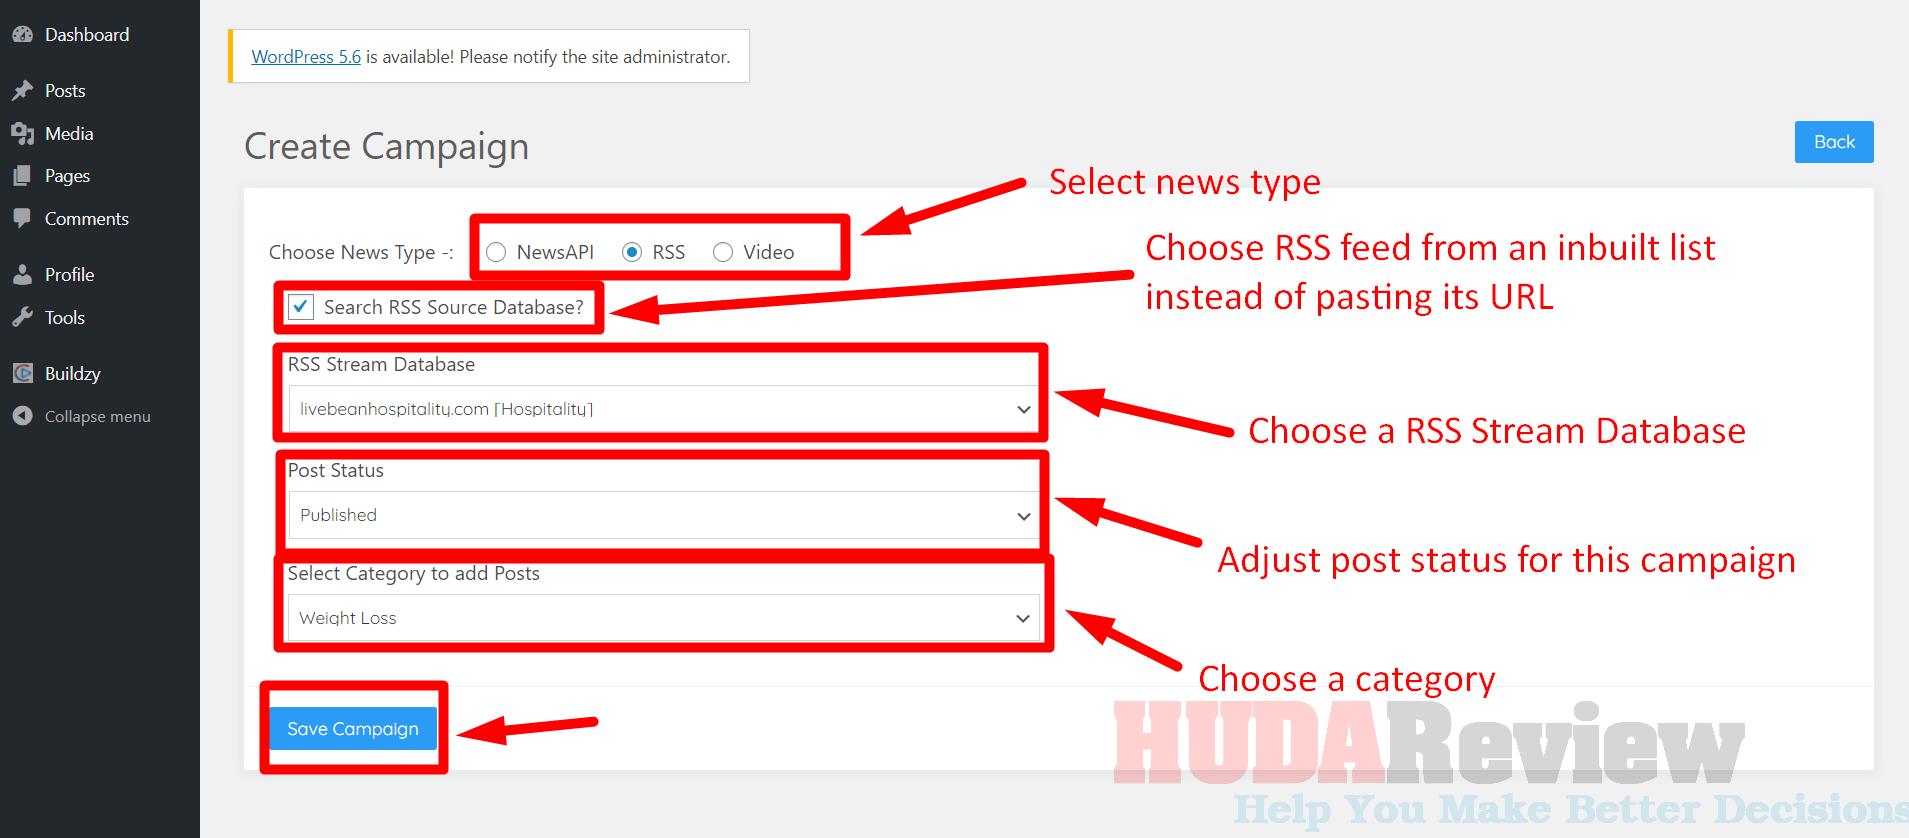 Buildzy-Review-Step-4